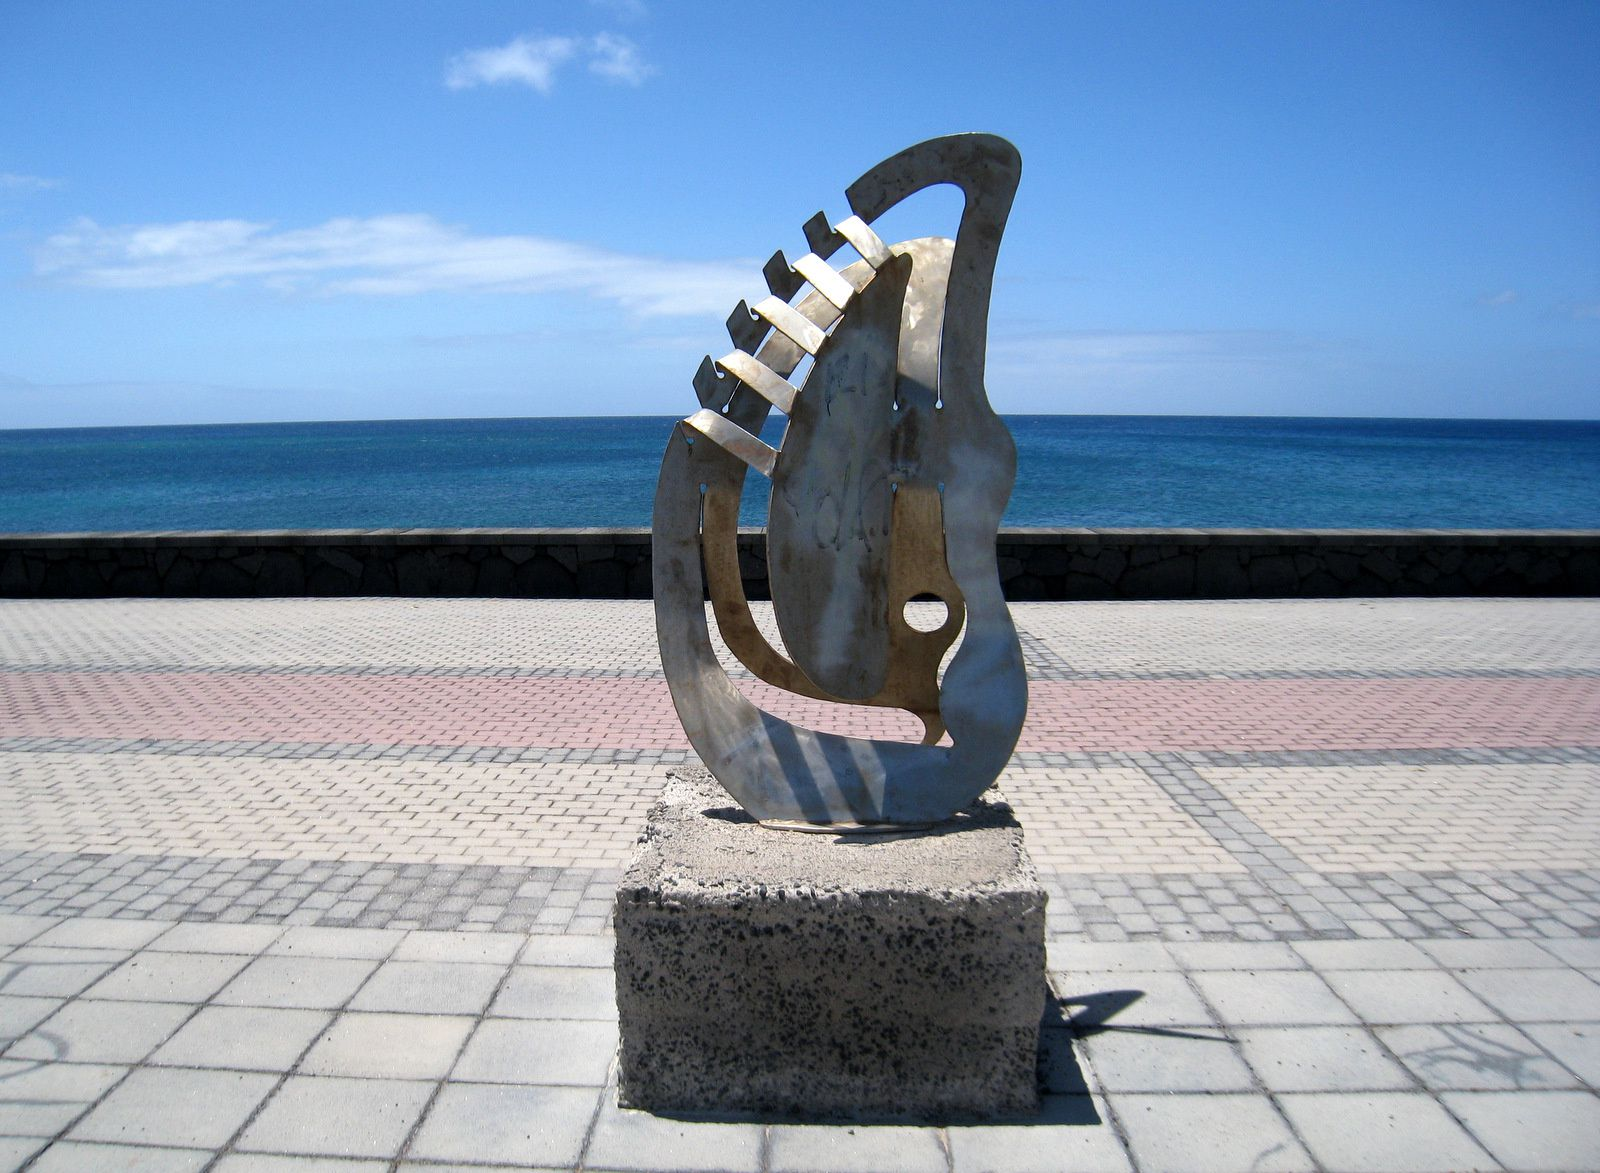 Sculptures à Arrecife (île de Lanzarote), 3/3